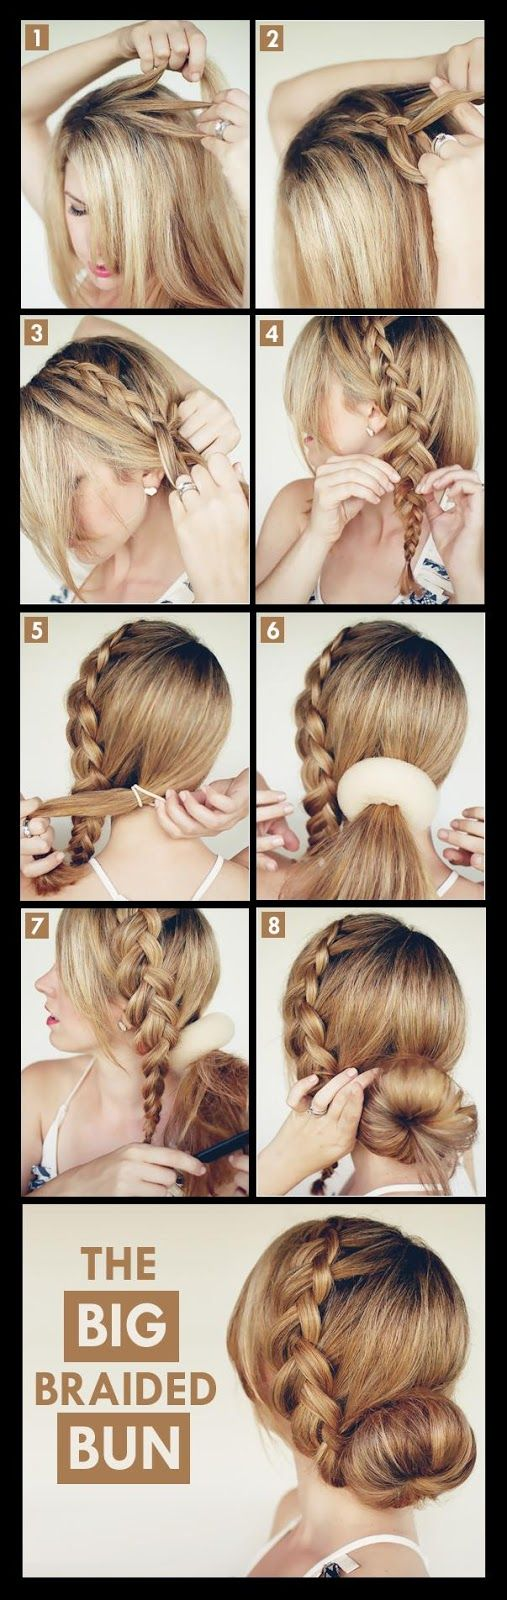 The big braided bun inspirhairtions pinterest hair hair